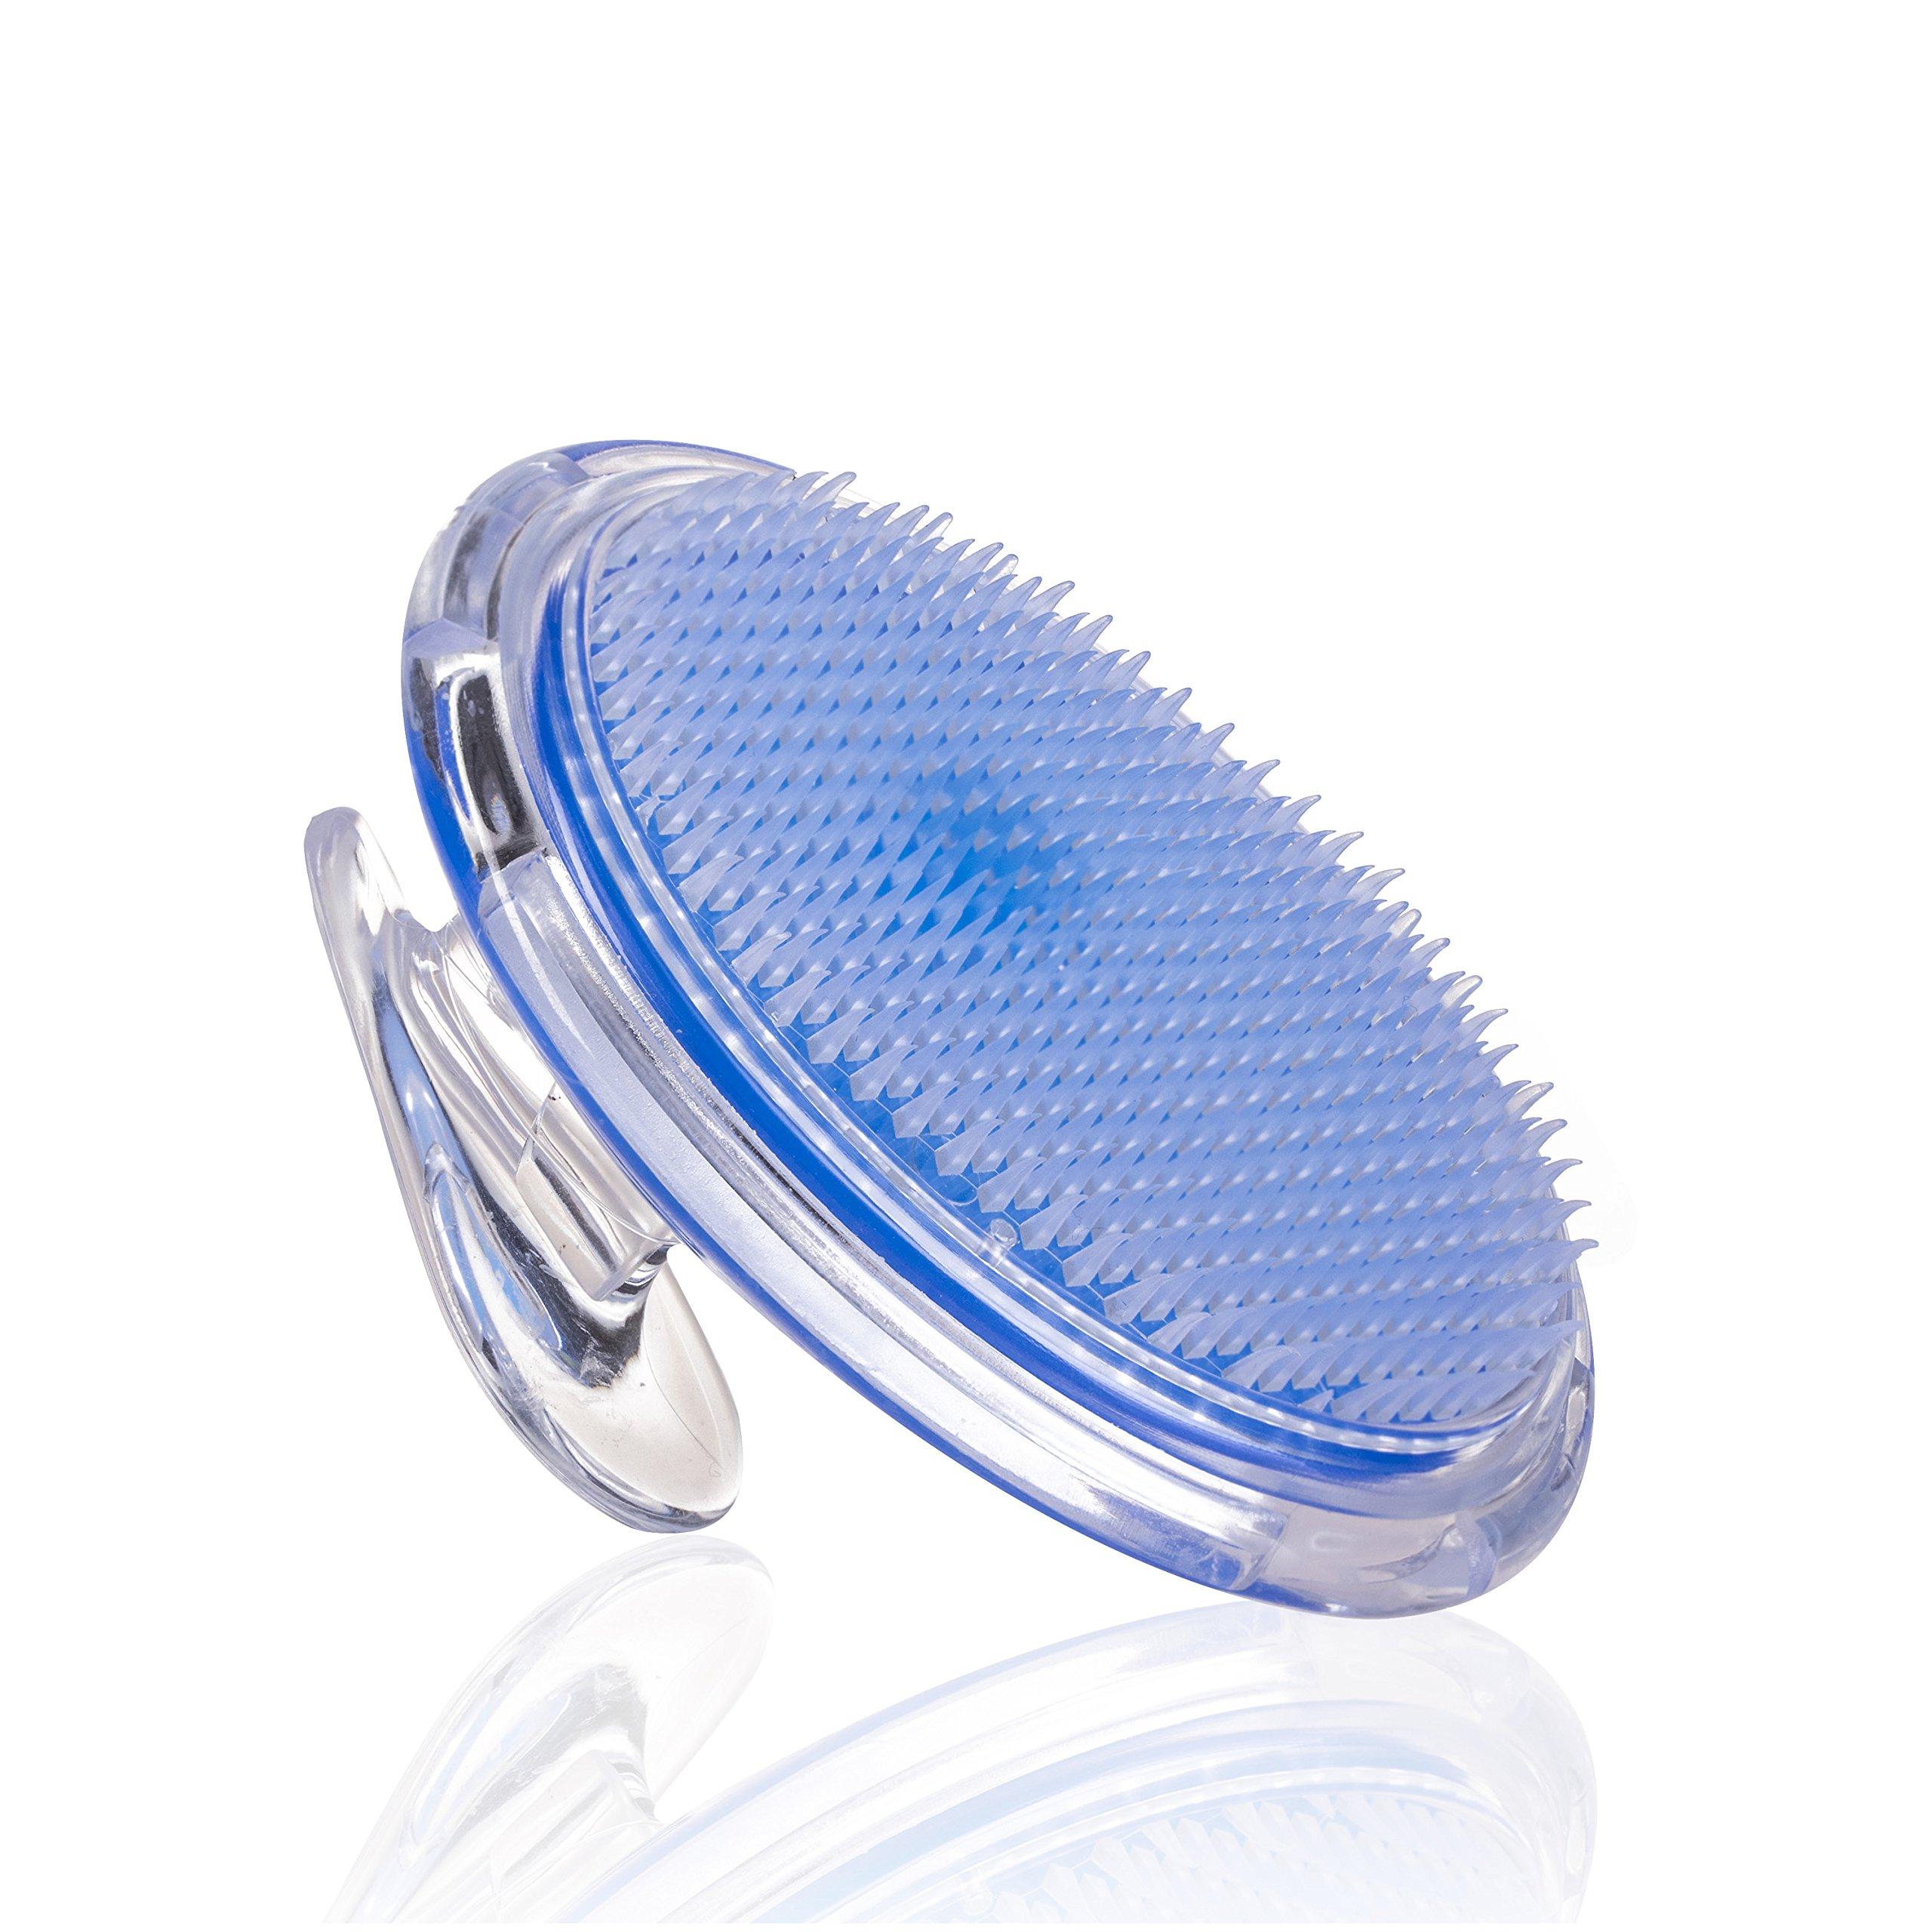 Exfoliating Brush - Ingrown Hair Treatment - Ingrown Hair Exfoliator for Men and Women - Bikini Line Exfoliator - Eliminate Razor Bumps and Shaving Irritation - Body Brush for Legs Armpit by SanDine